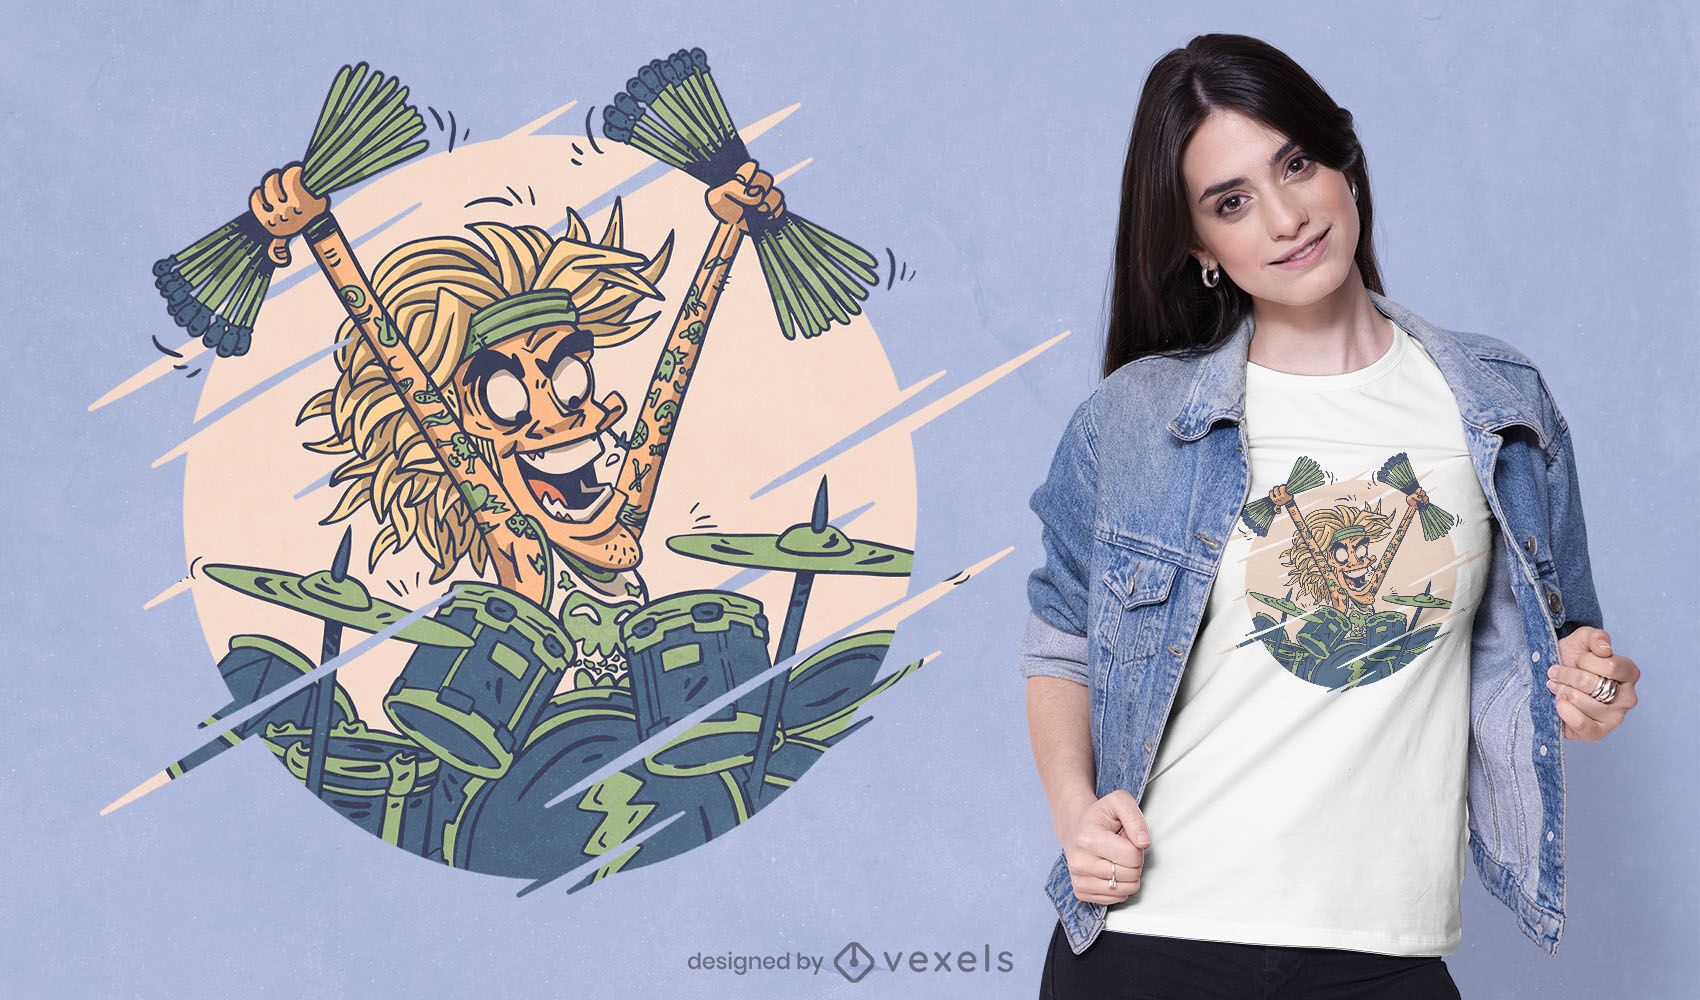 Crazy drummer t-shirt design